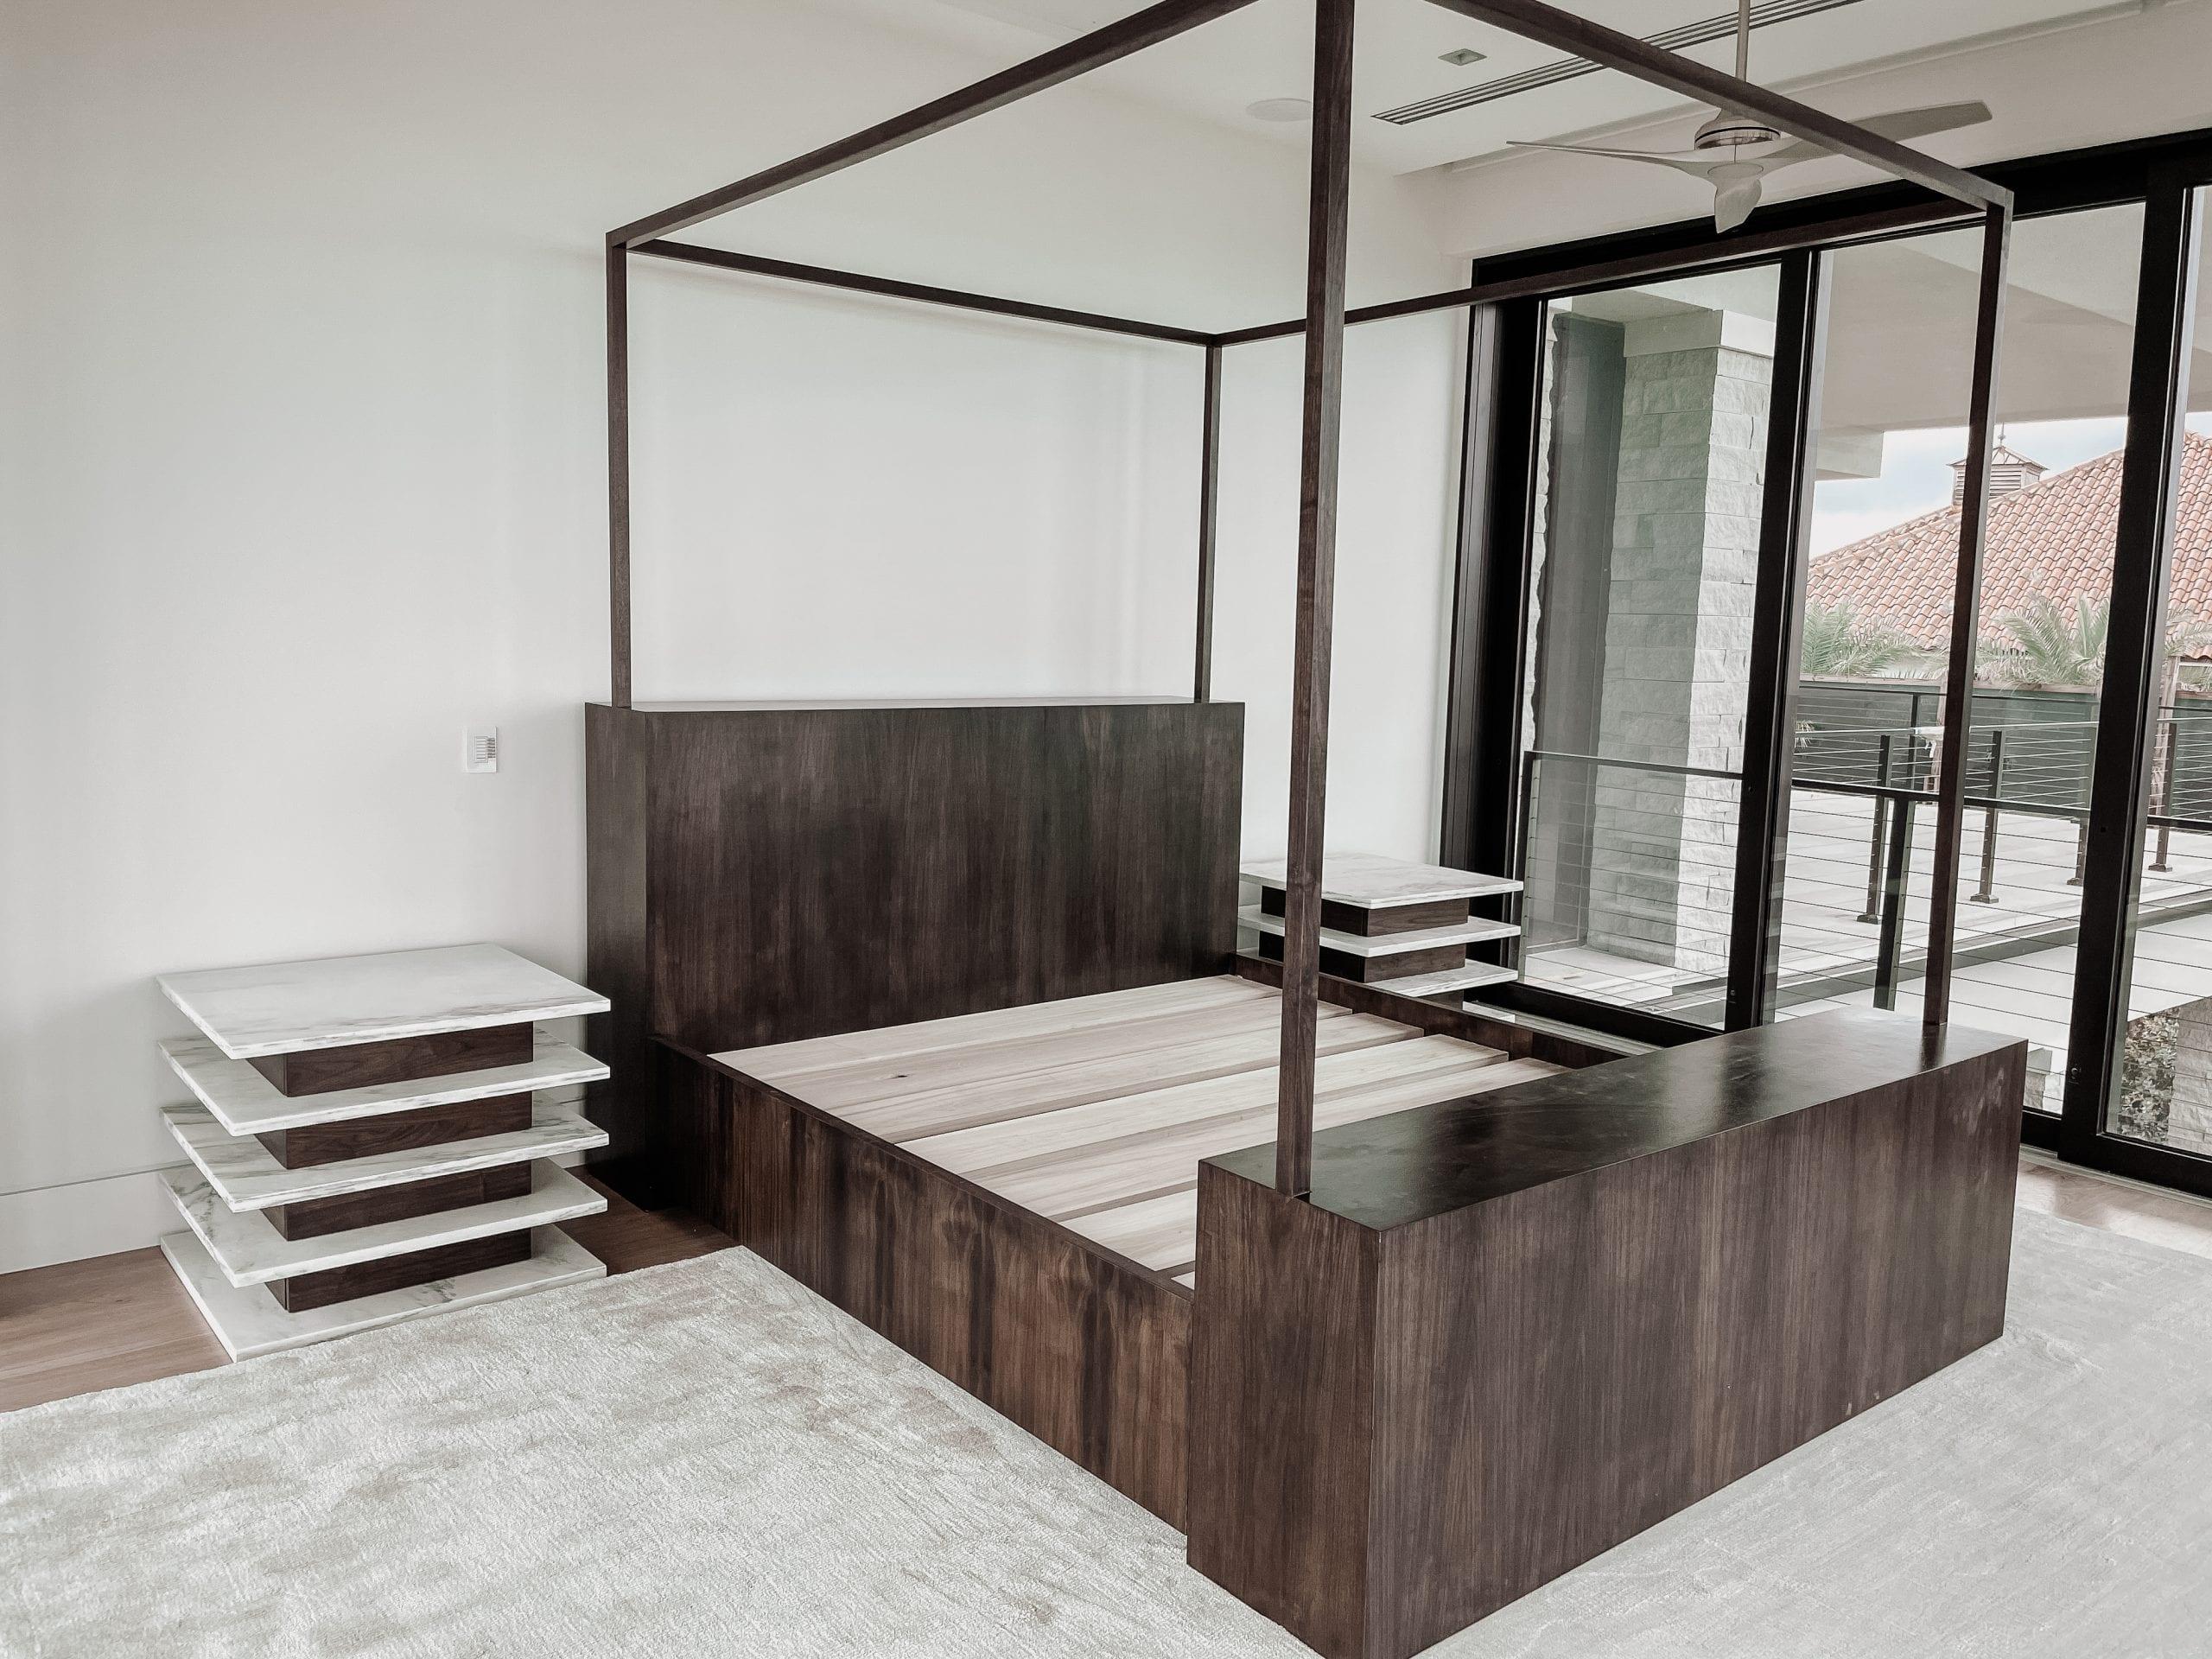 Walnut and Marble Master Bedroom Set